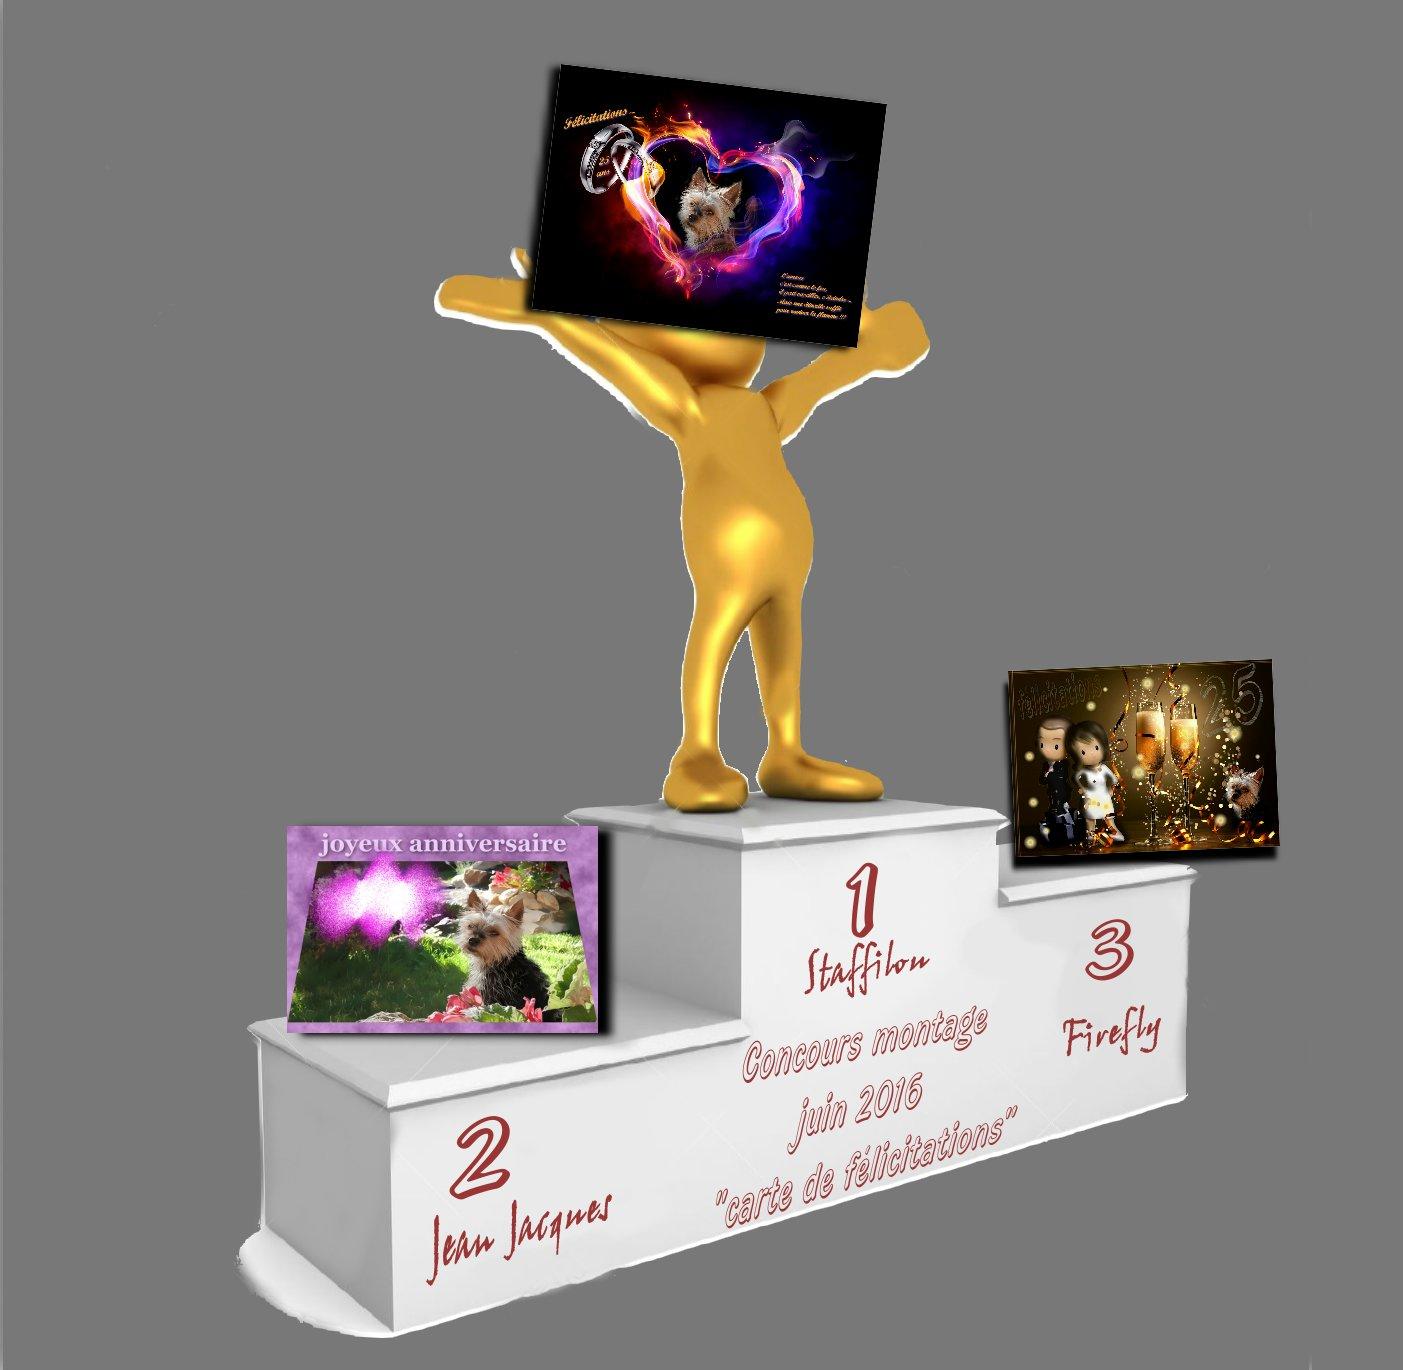 "Concours montage juin 2016 ""Carte de Félicitations"" (terminé) 234368podiumjuin"